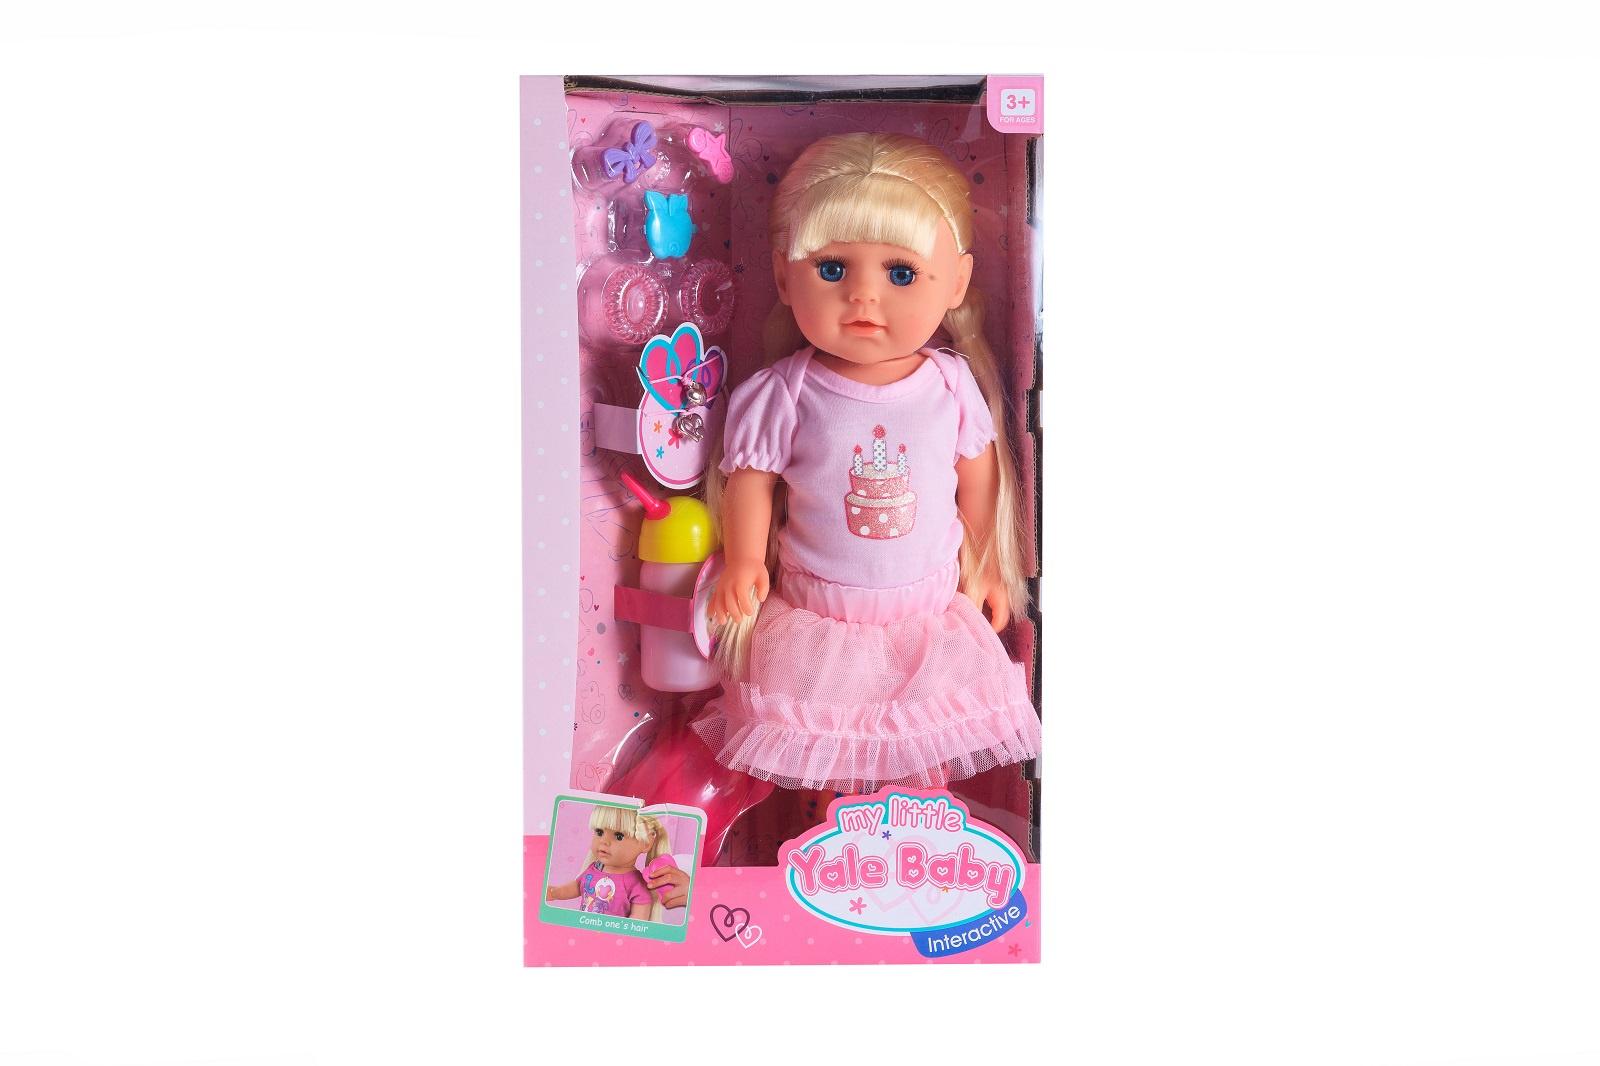 Кукла функциональная Sister, с аксессуарами, 40 см кукла s s toys 1025 doll